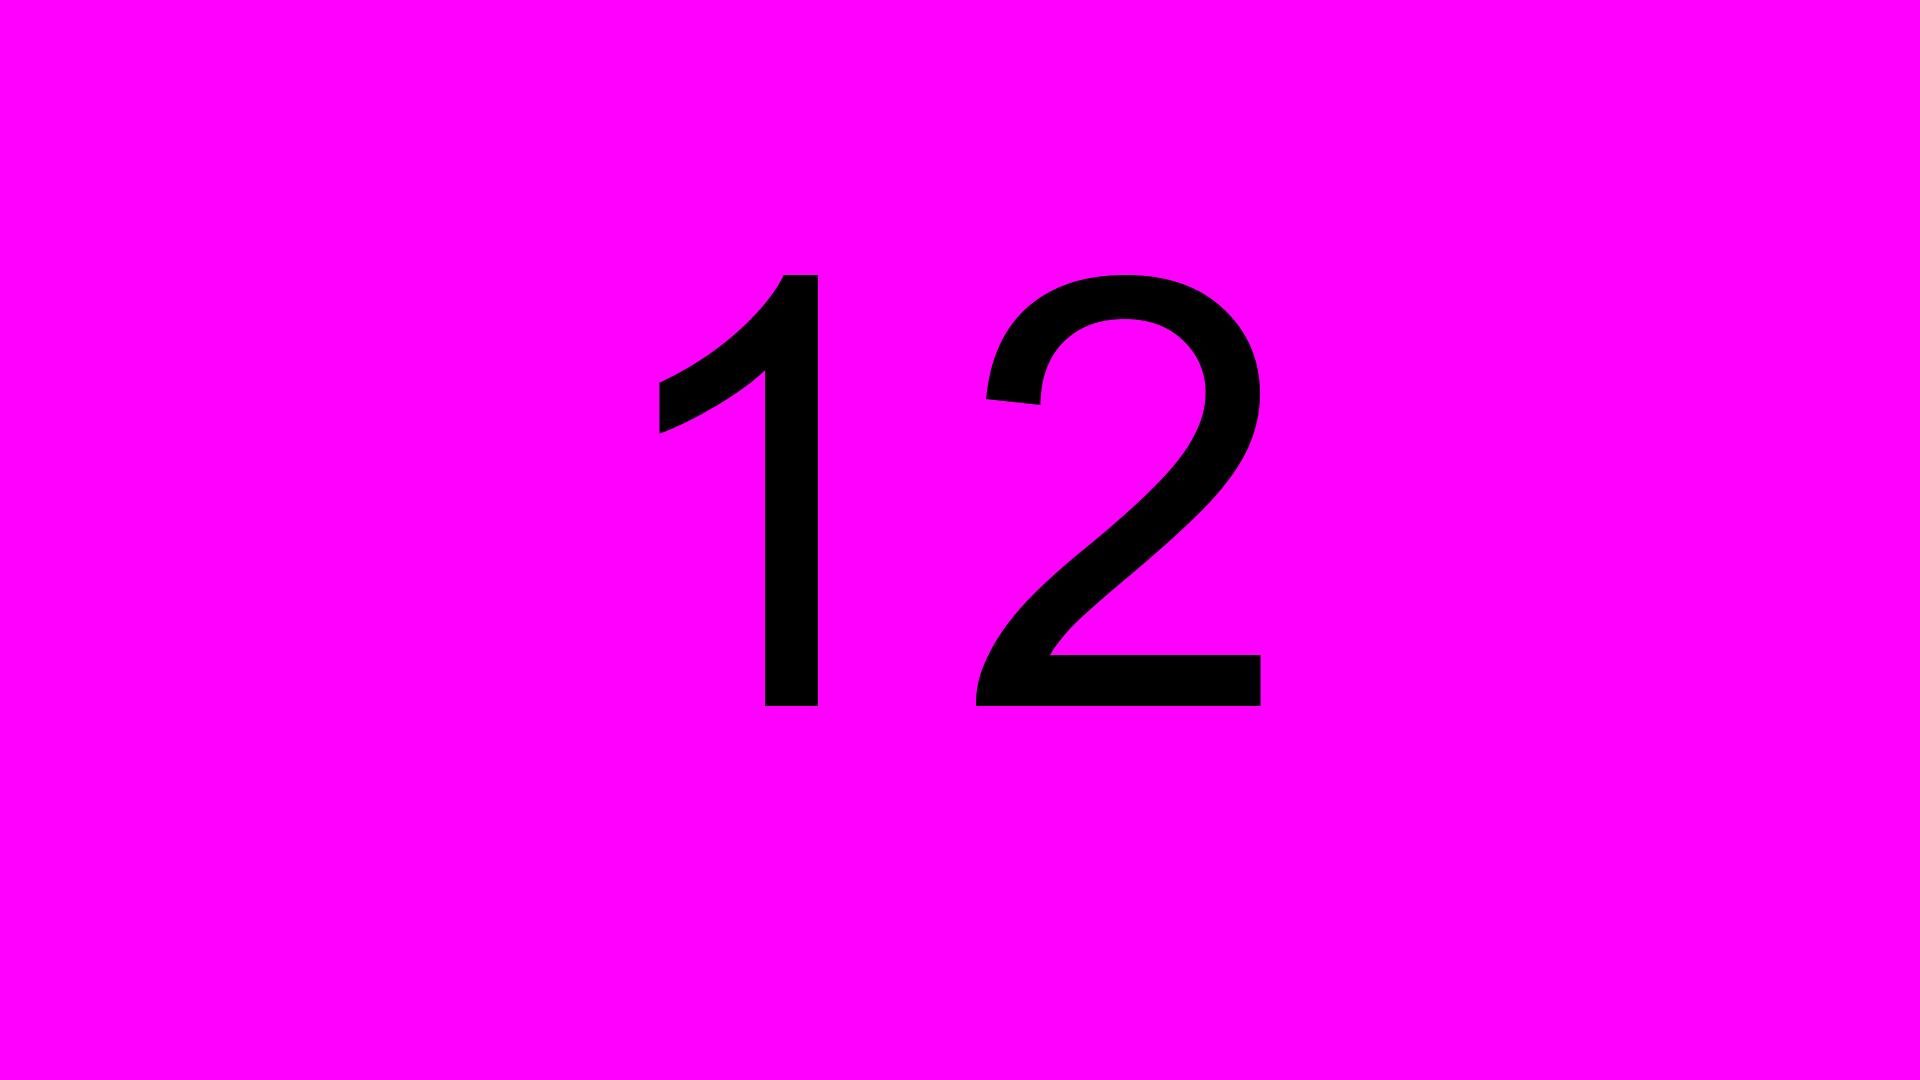 Magenta_12